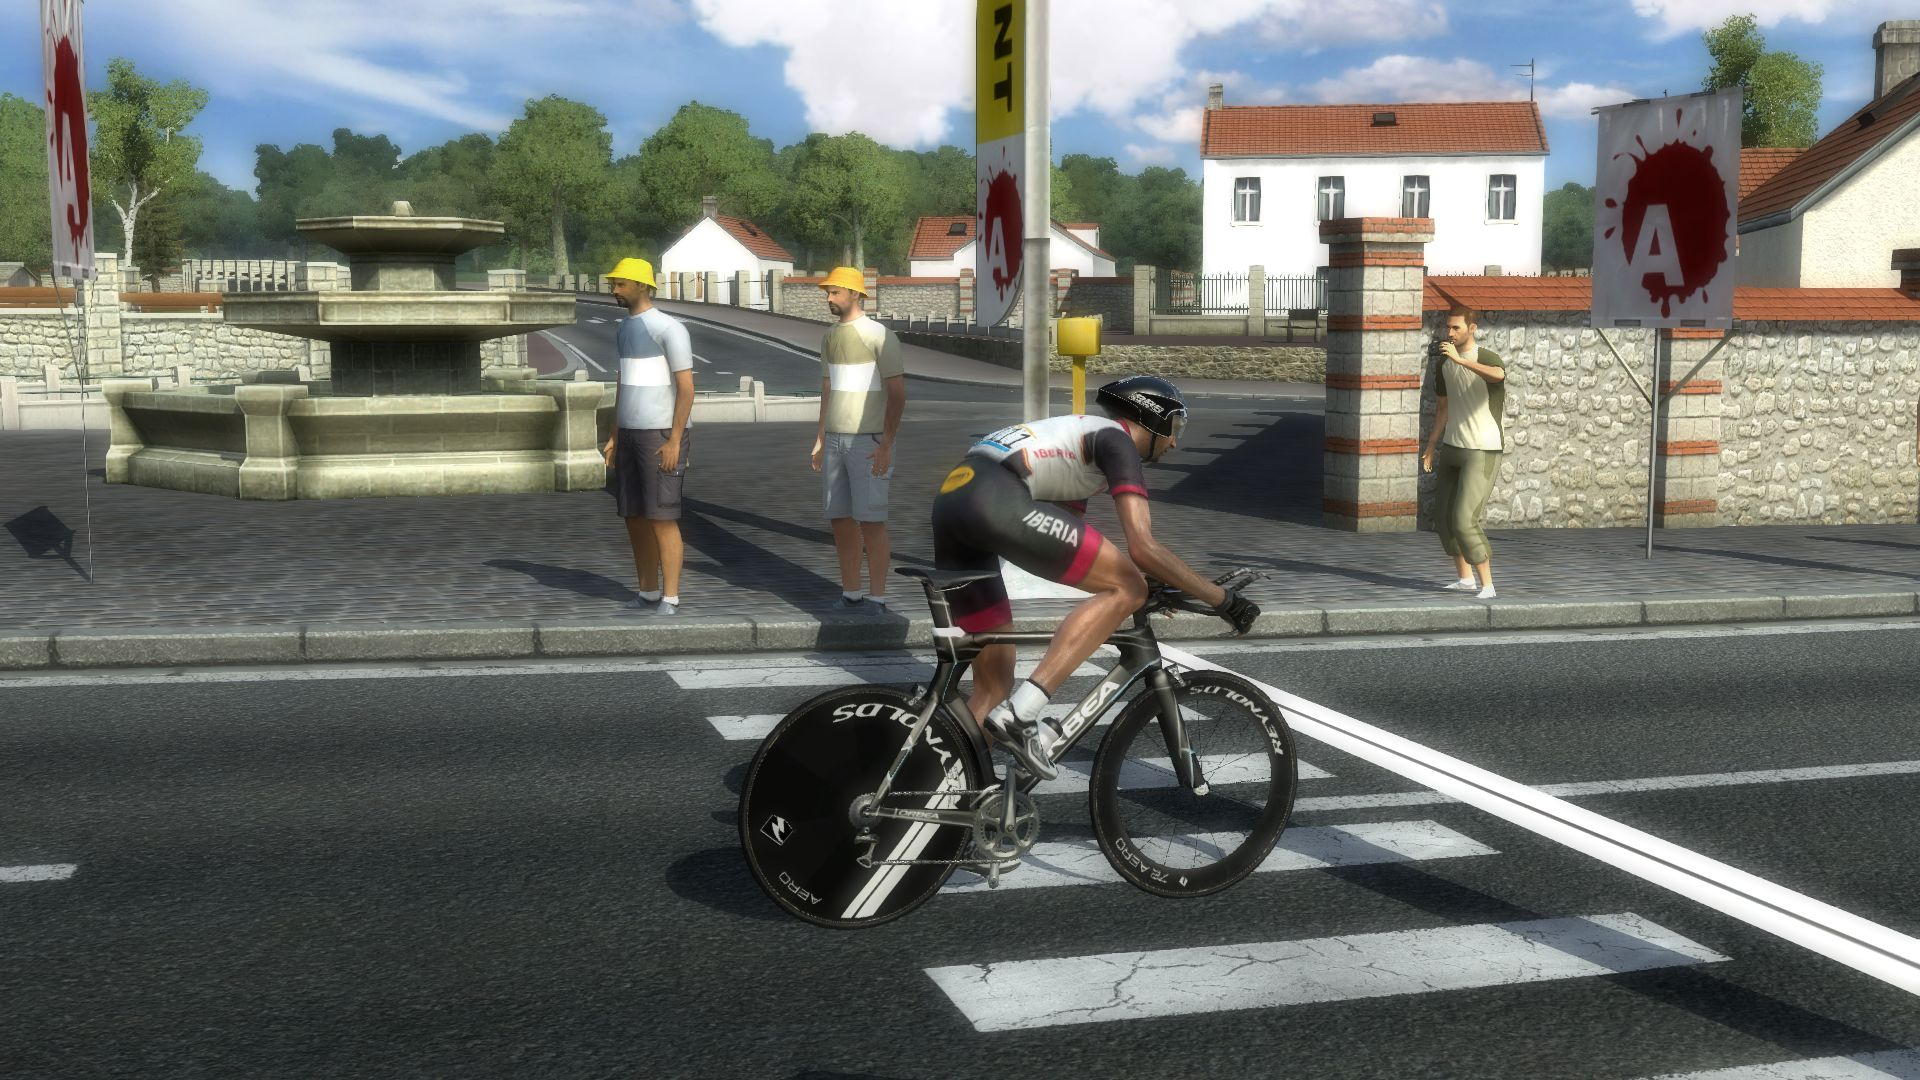 pcmdaily.com/images/mg/2019/Races/C1/Bayern/S4/mg19_bay_s04_39.jpg